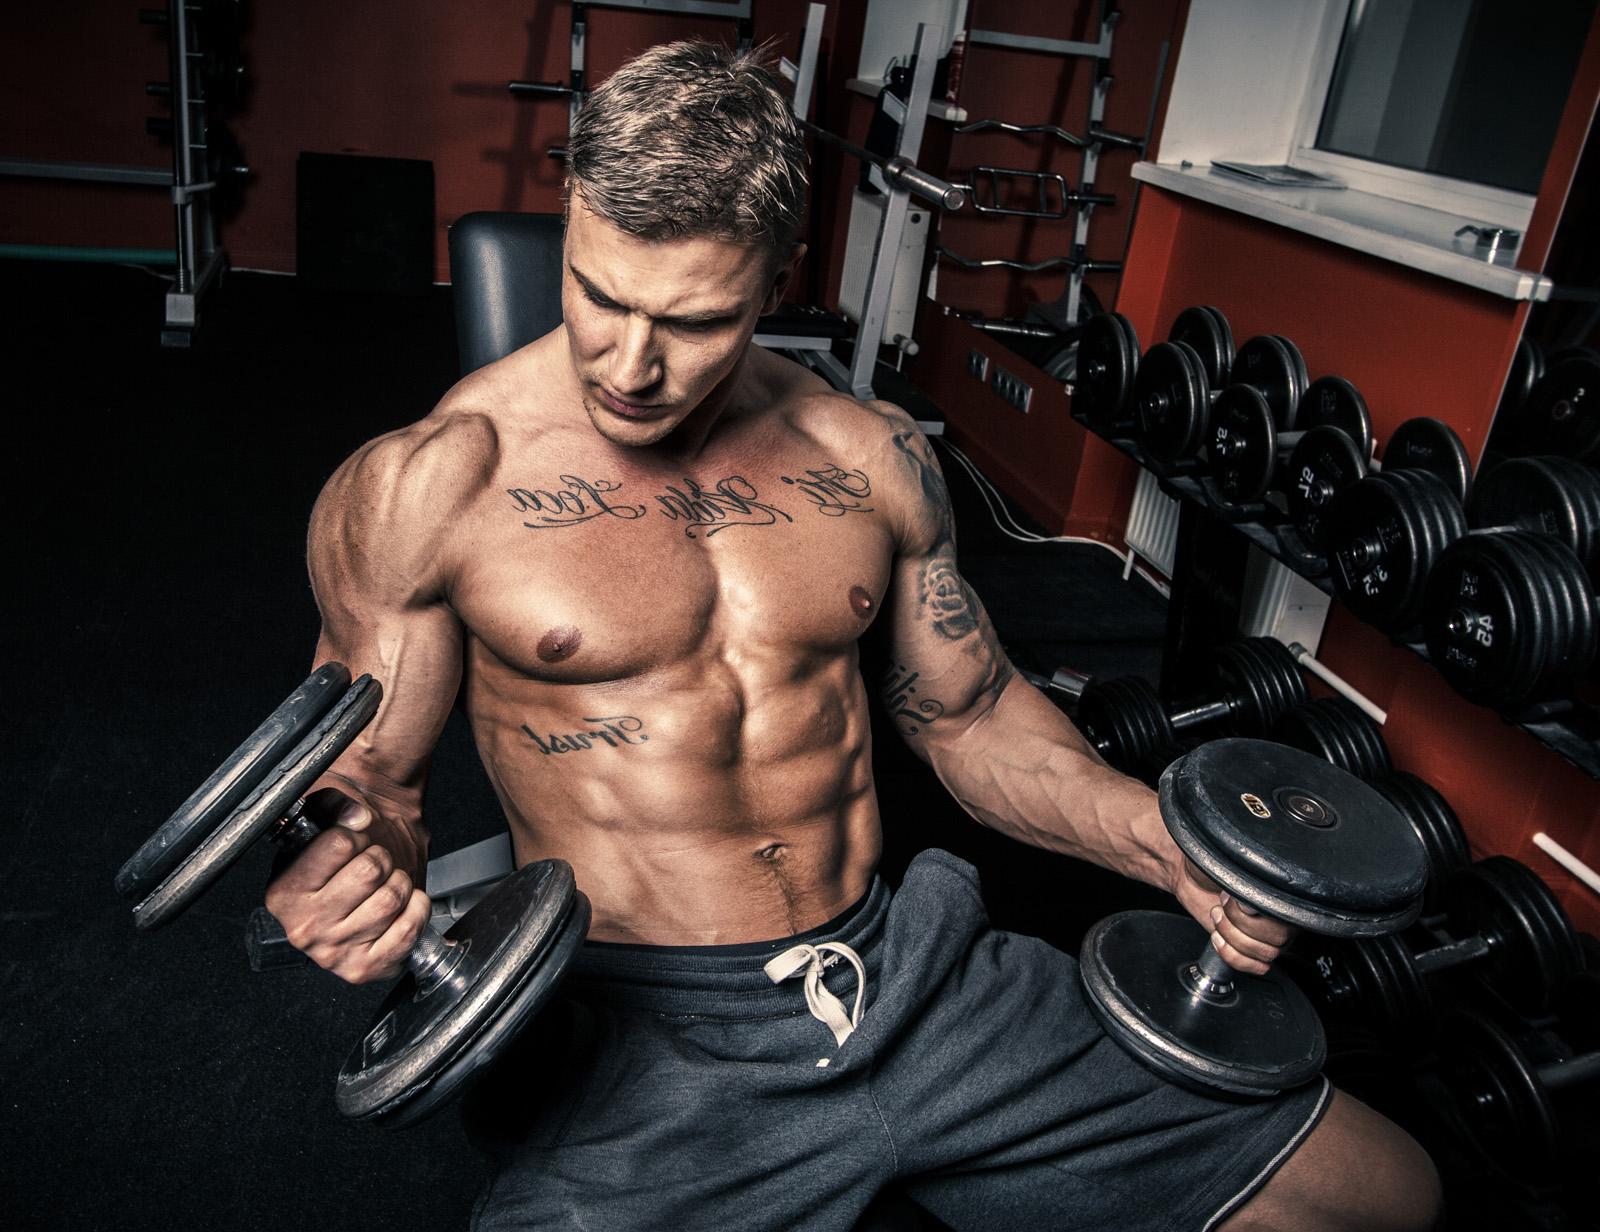 Muscular guy holding dumbells